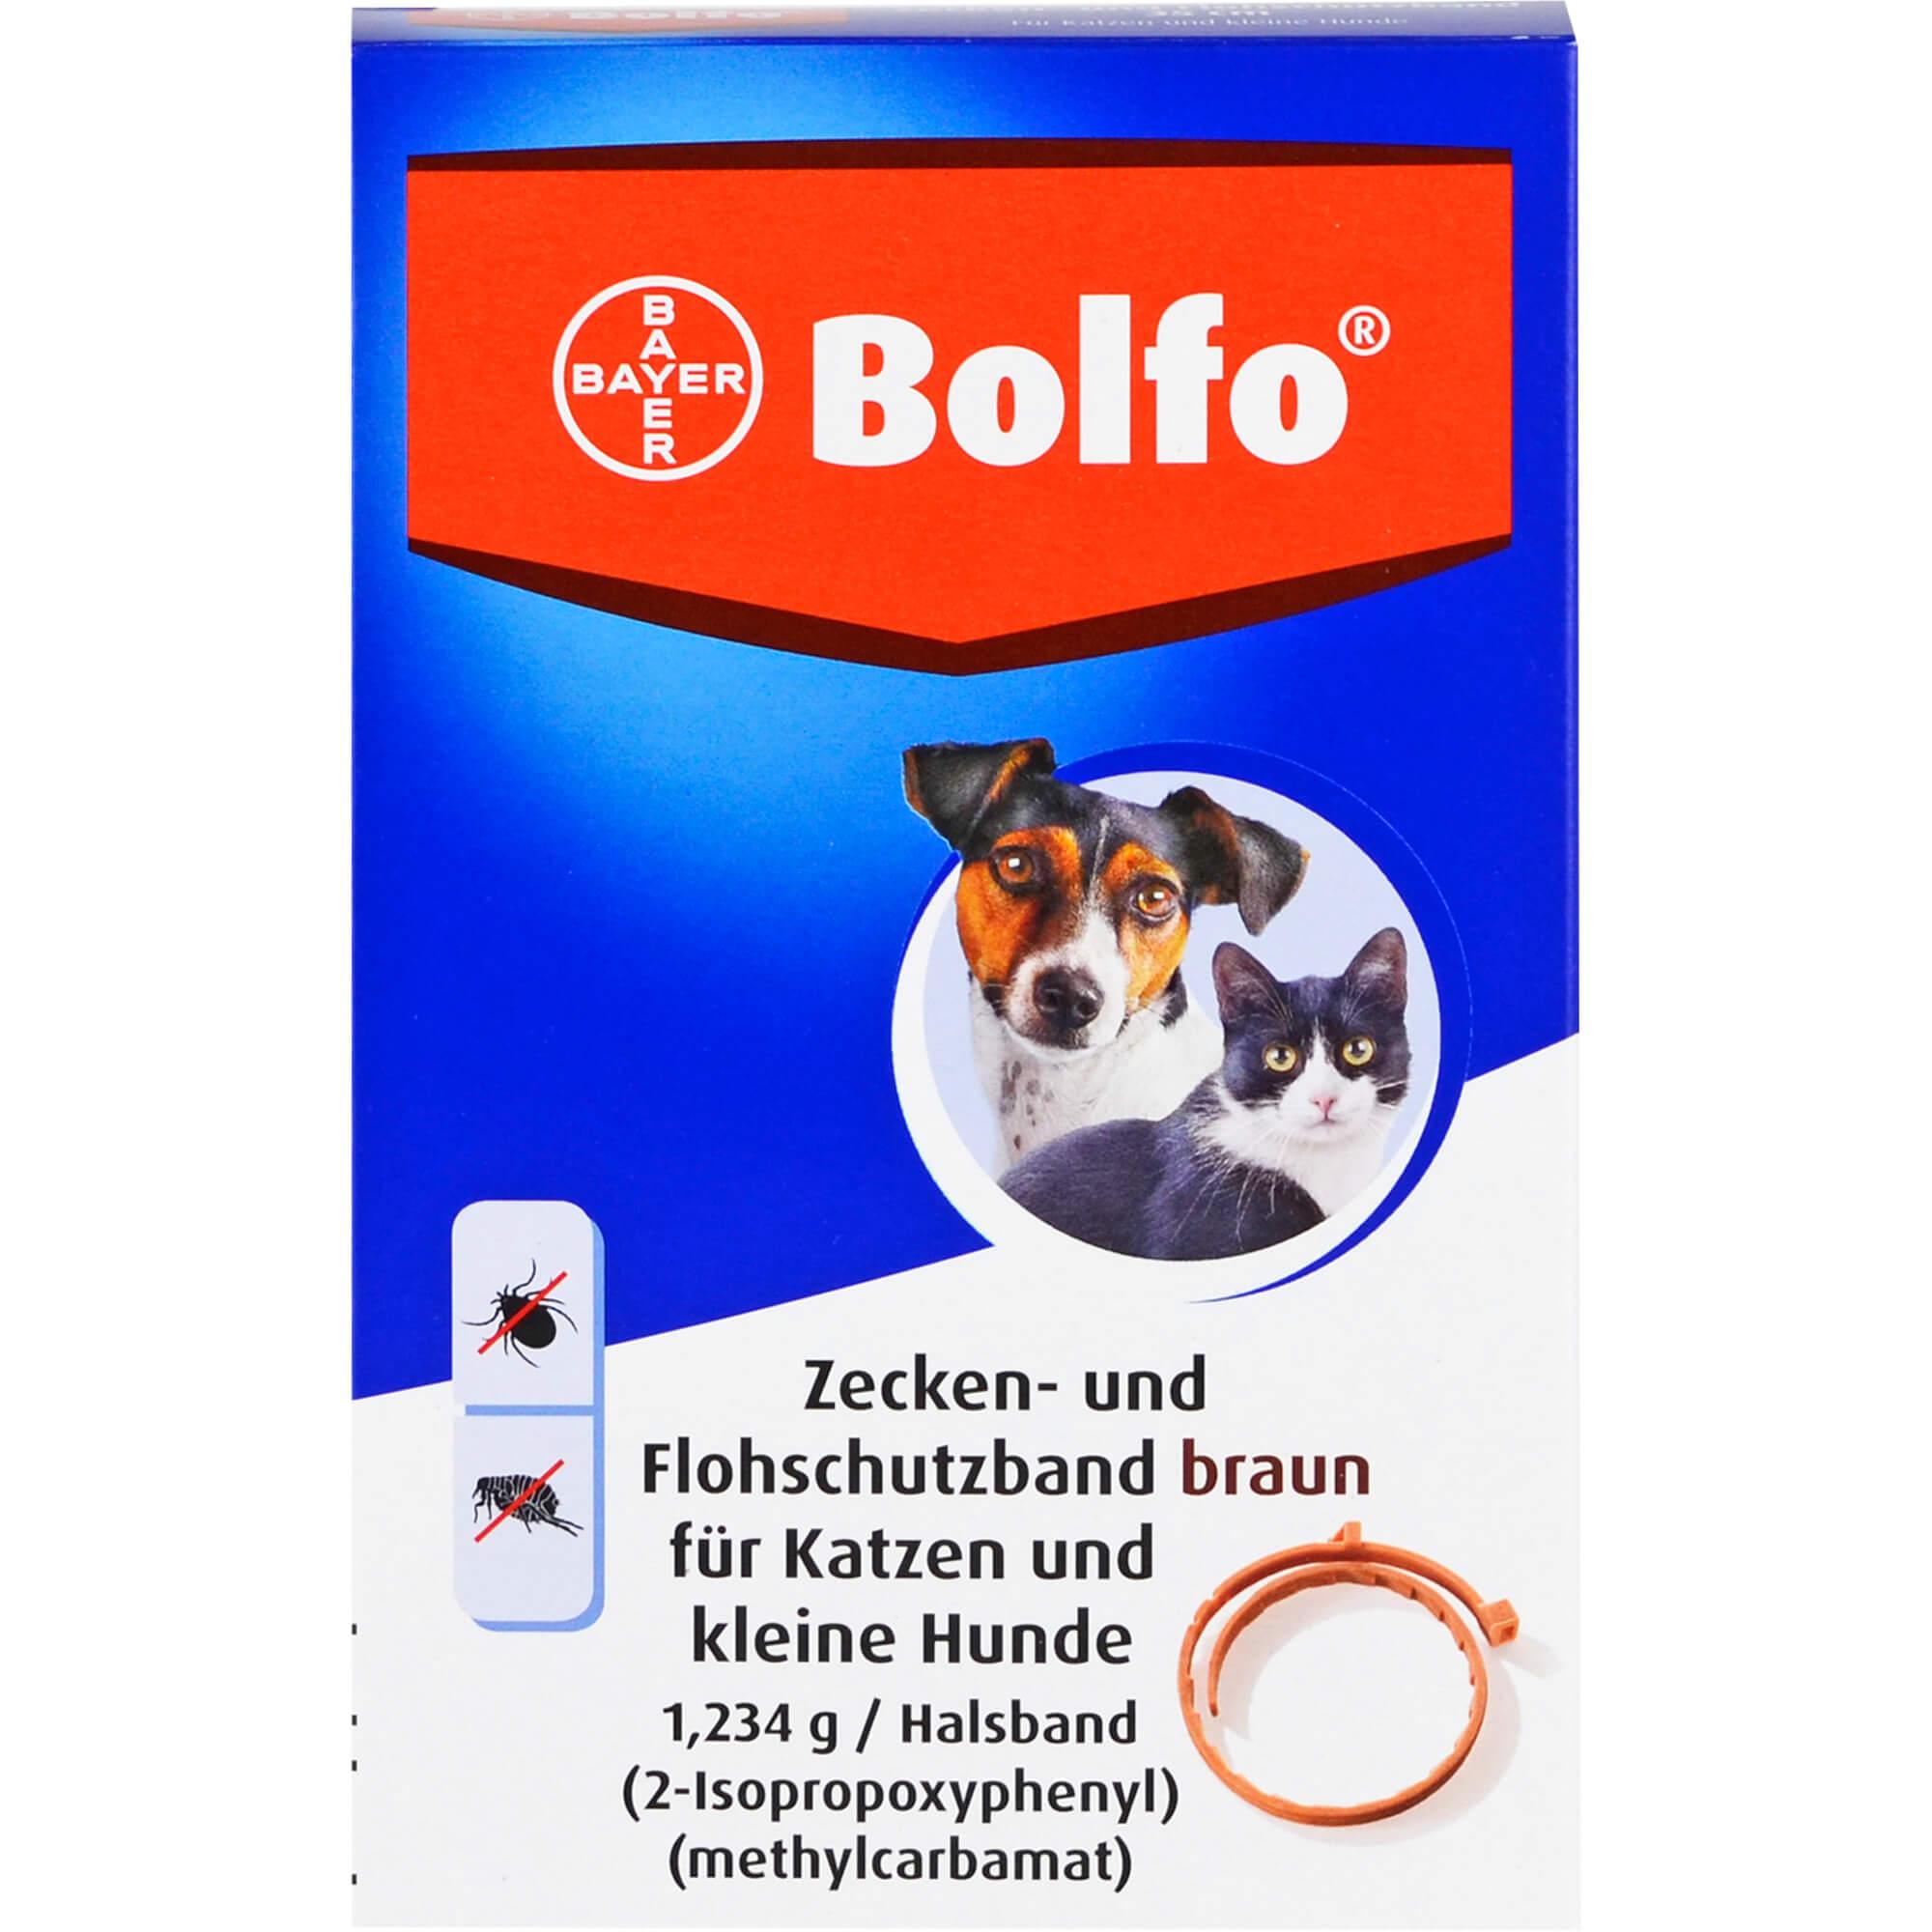 BOLFO Flohschutzband braun f.kleine Hunde/Katzen